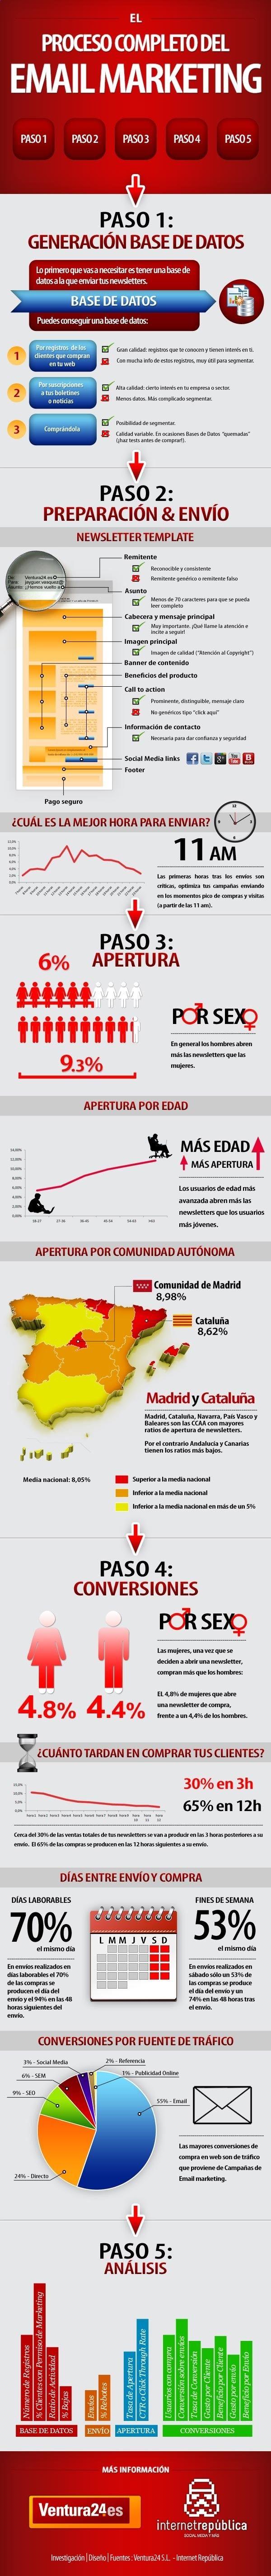 infografia de email marketing en España. Mejores días, horas y datos clave.